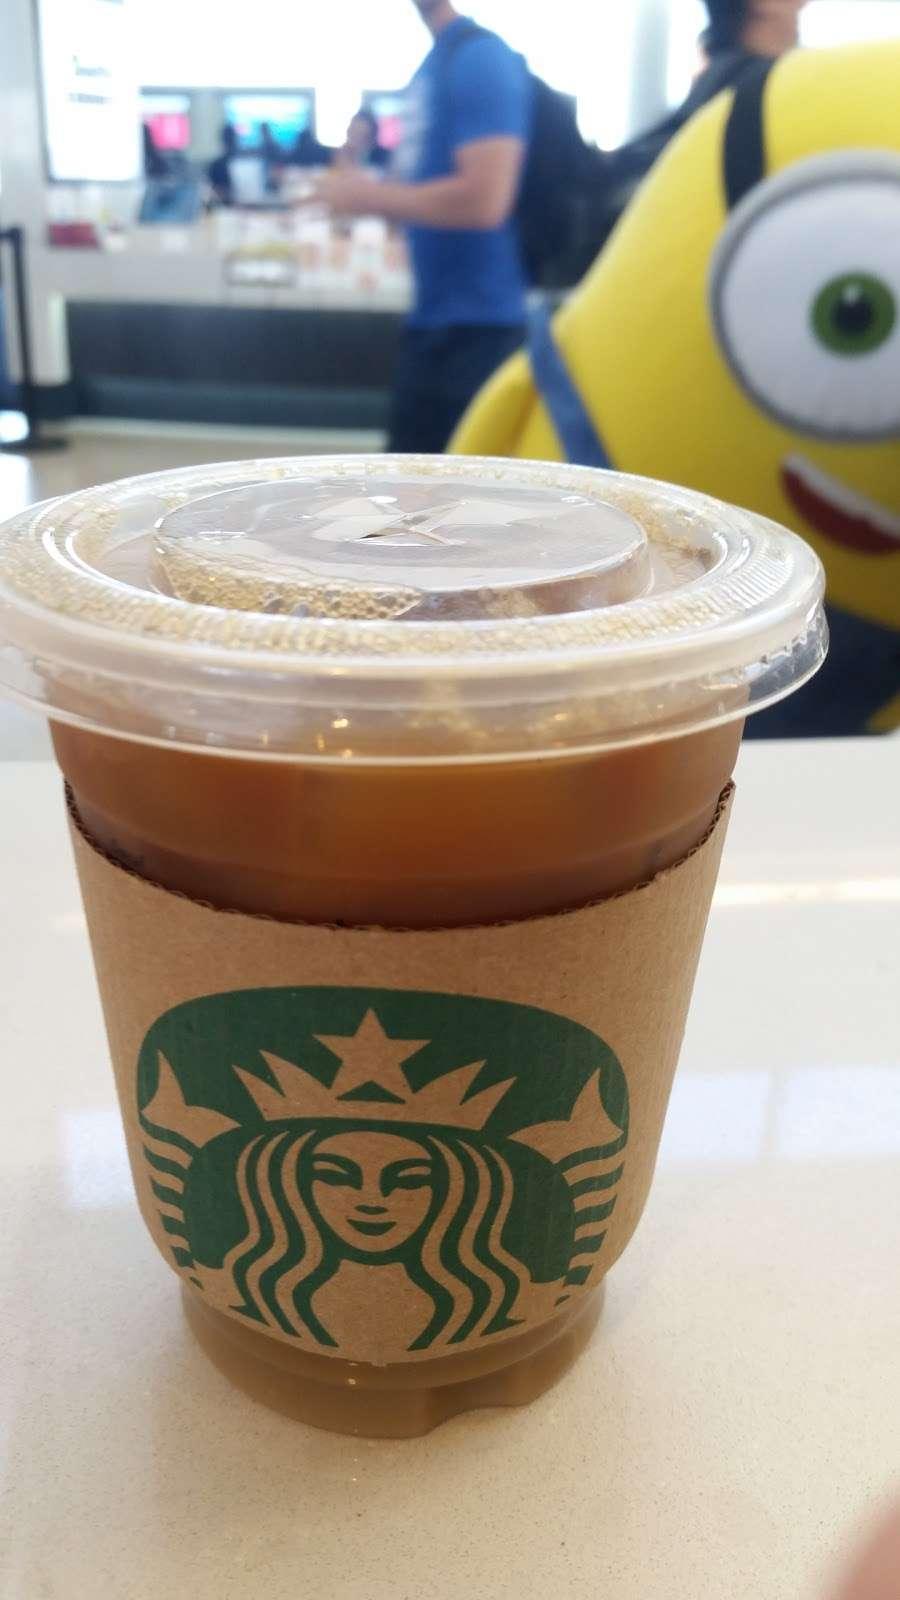 Starbucks - cafe  | Photo 10 of 10 | Address: 600 World Way, Los Angeles, CA 90045, USA